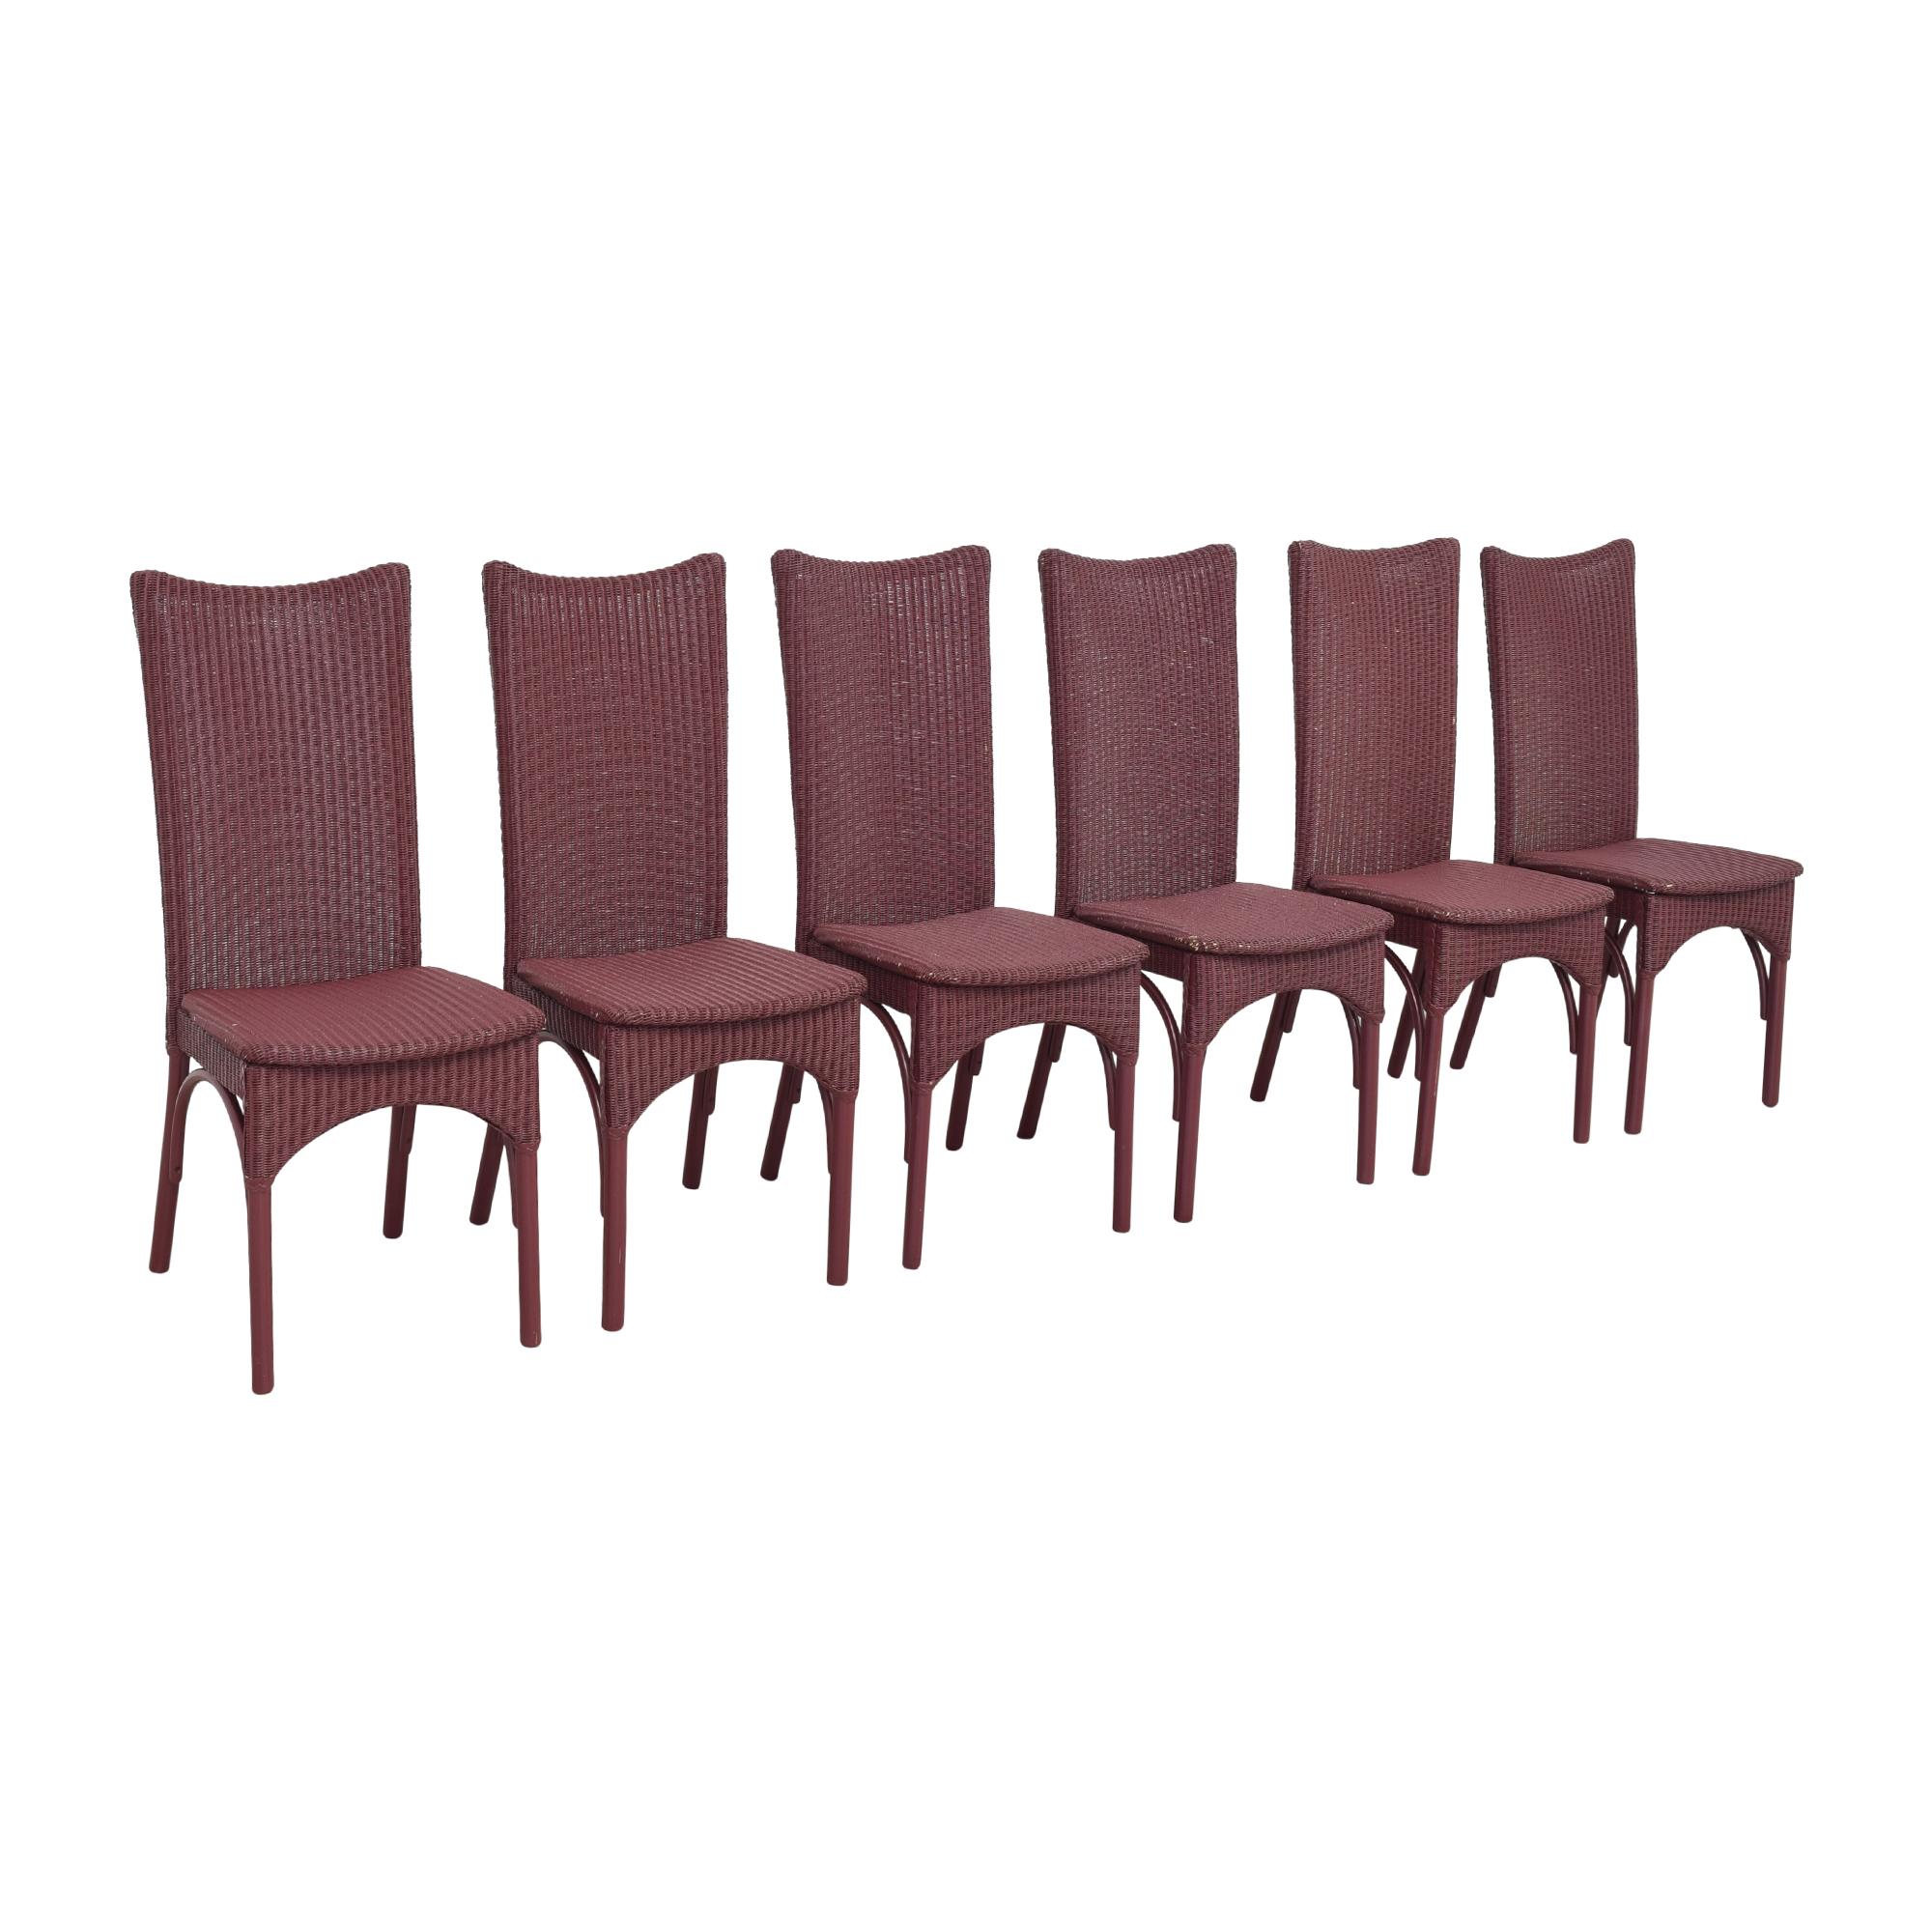 Loom USA Loom High Back Dining Chairs discount